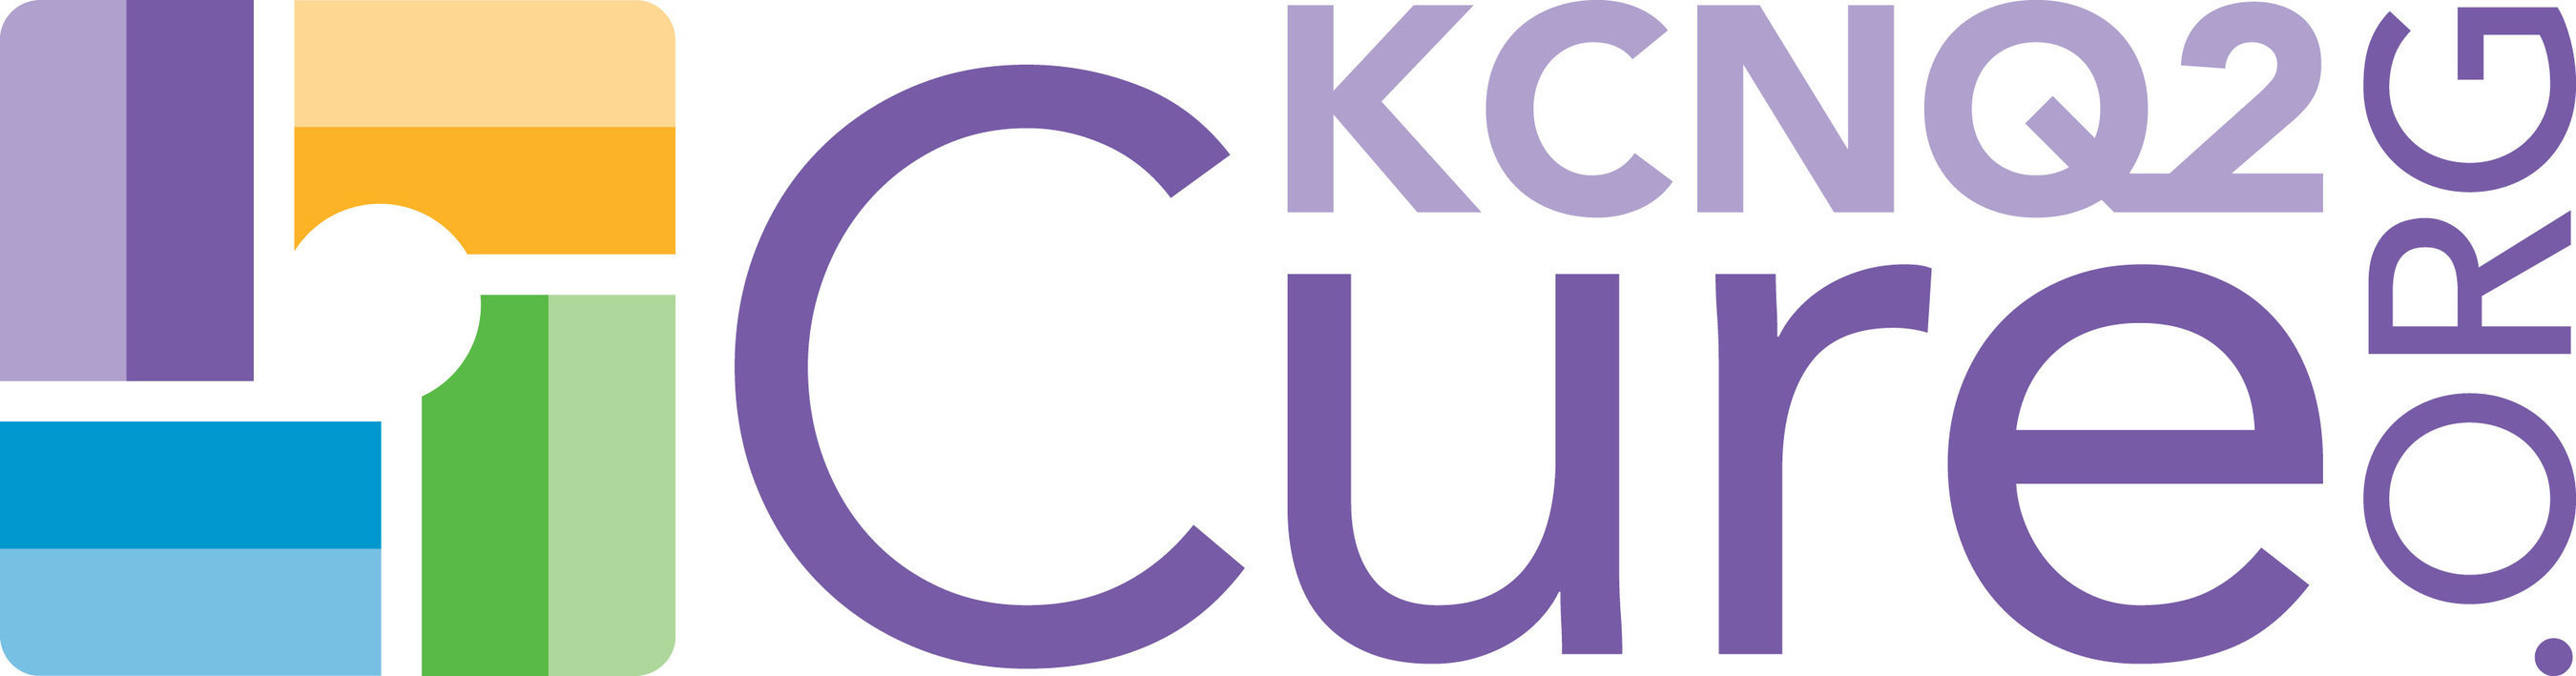 KCNQ2 Cure Alliance (PRNewsFoto/KCNQ2 Cure Alliance)